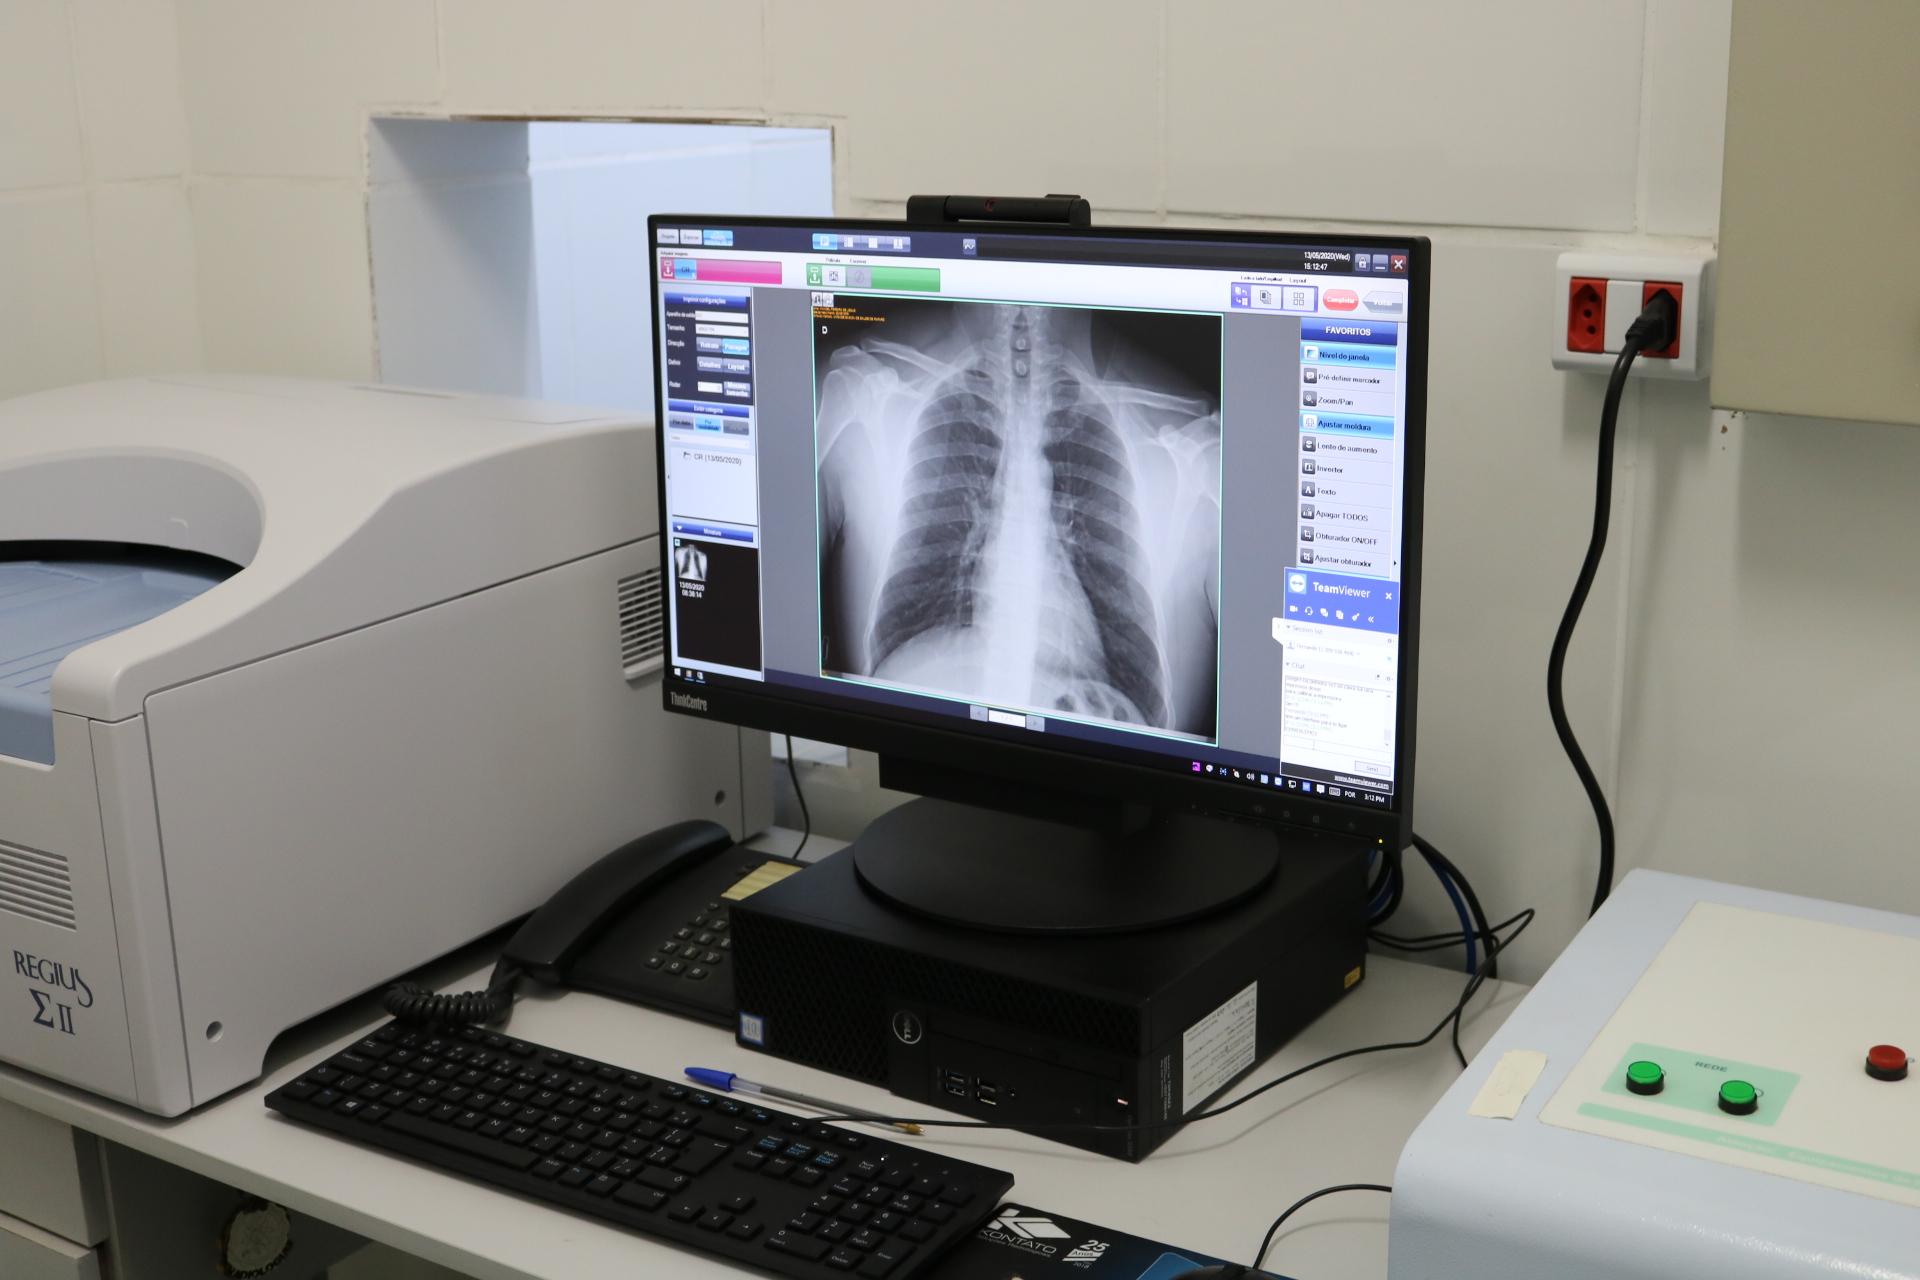 Saúde adquire Raio-X Digital